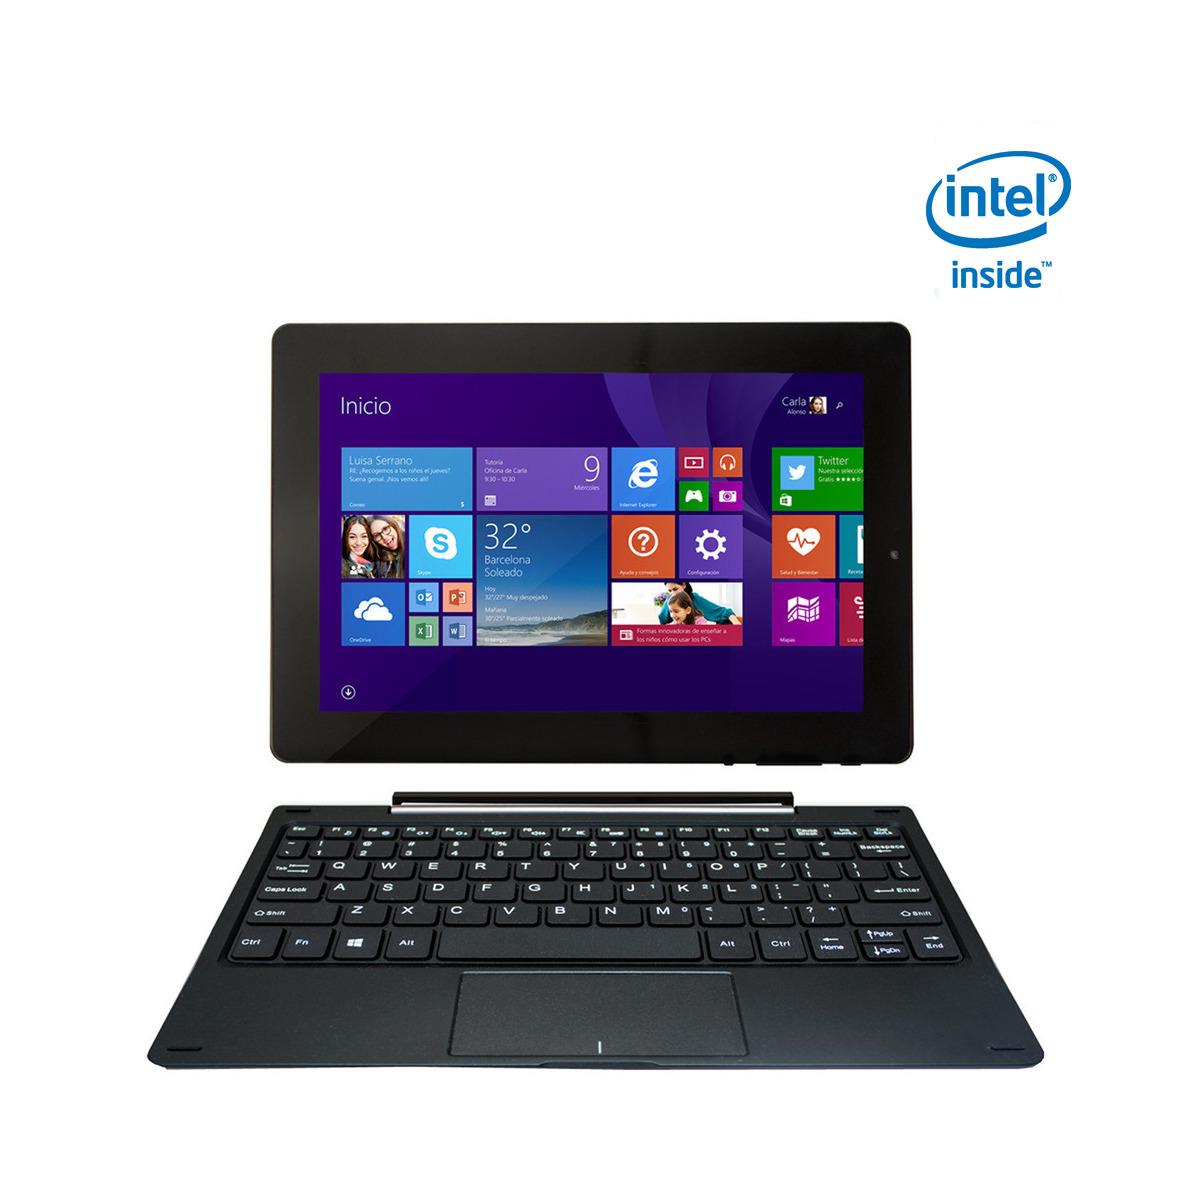 Portátil convertible 2 en 1 Vexia 10,1'' Portable 10 Intel Atom Z3735G Quad Core